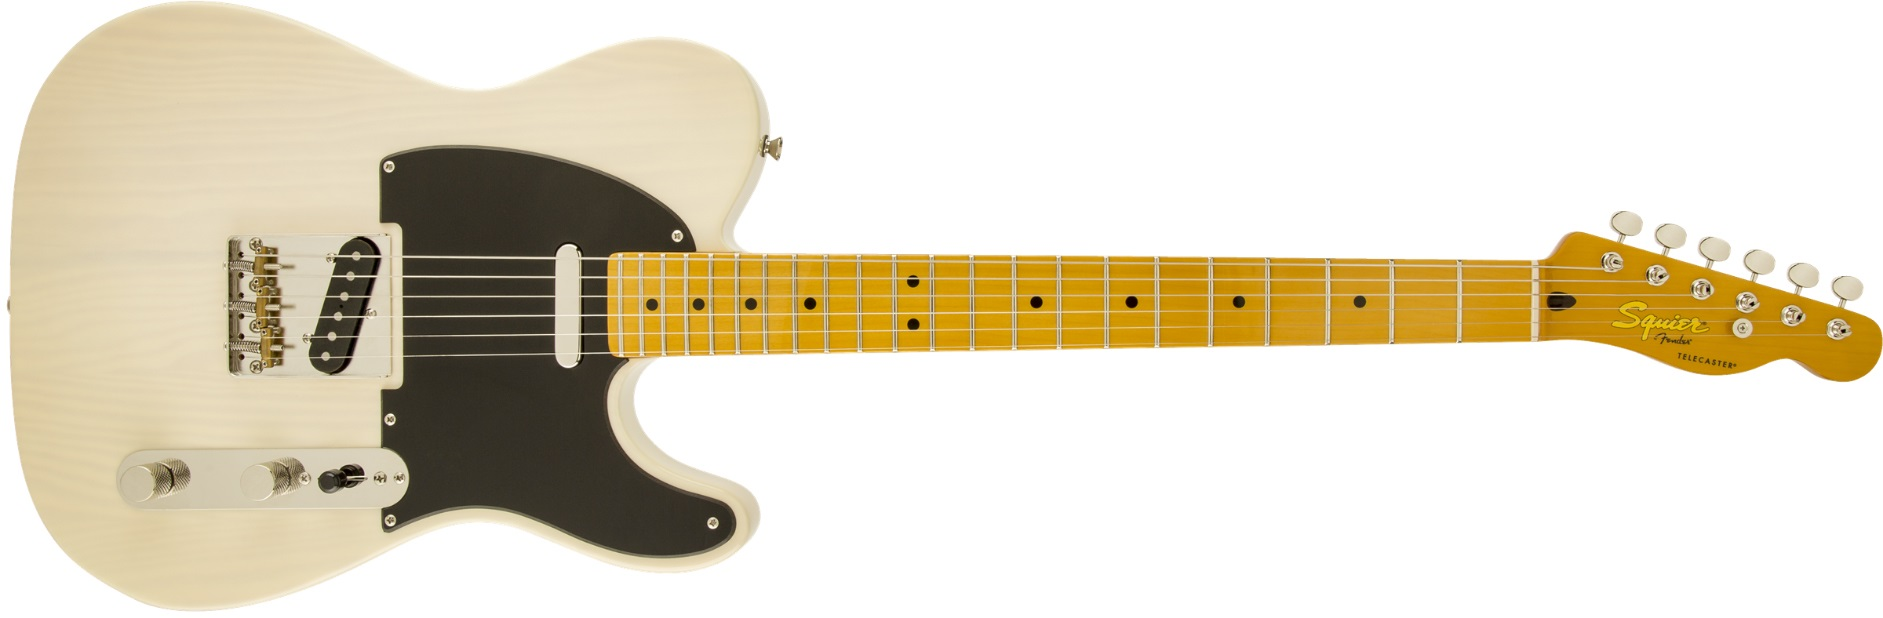 Fender Squier Classic Vibe Telecaster 50s MN VB